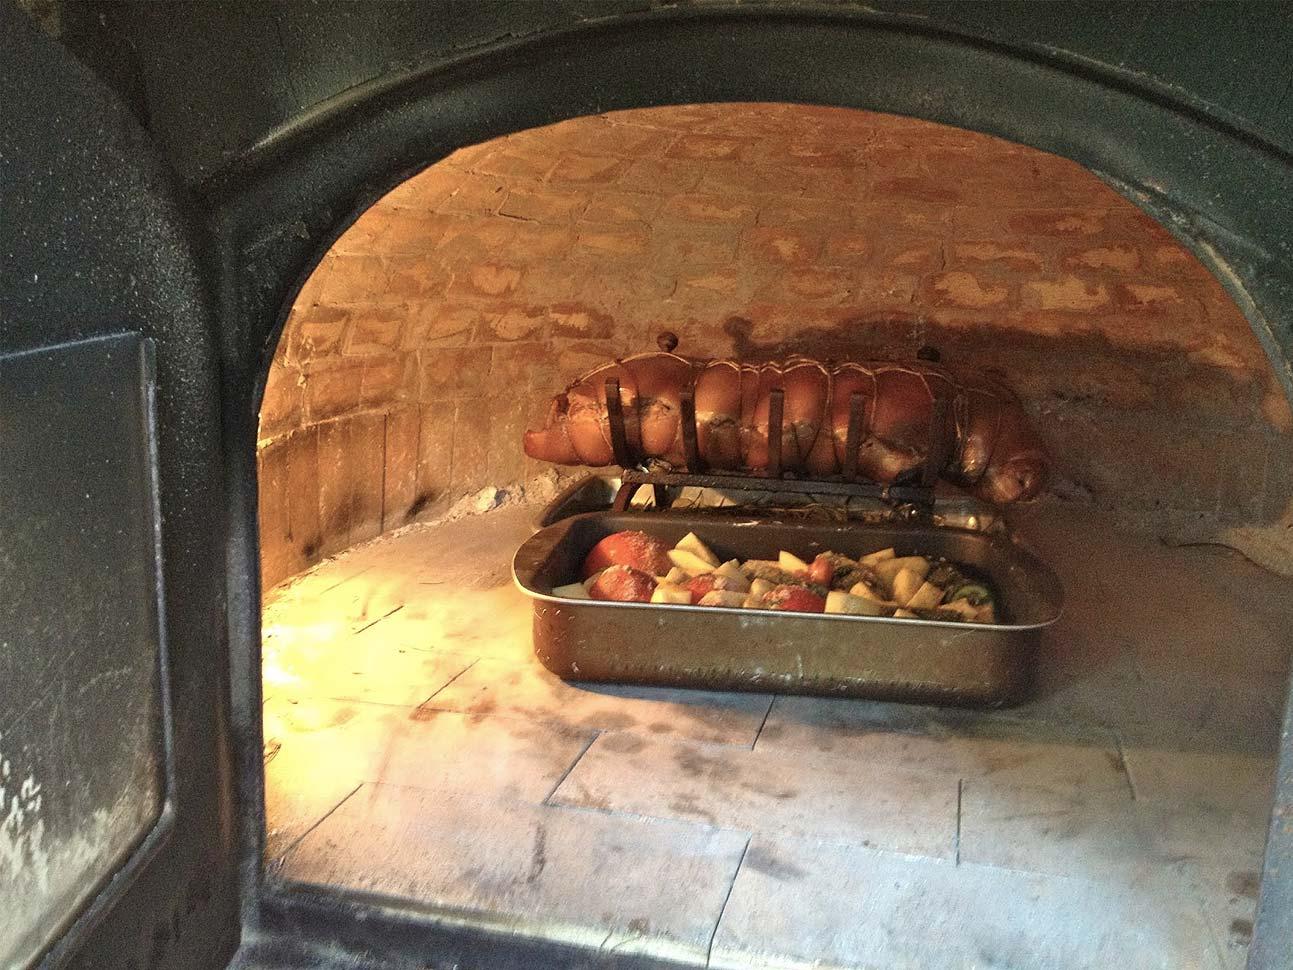 Forno A Legna Immagini how to cooking in a wood oven - silvio cicchi